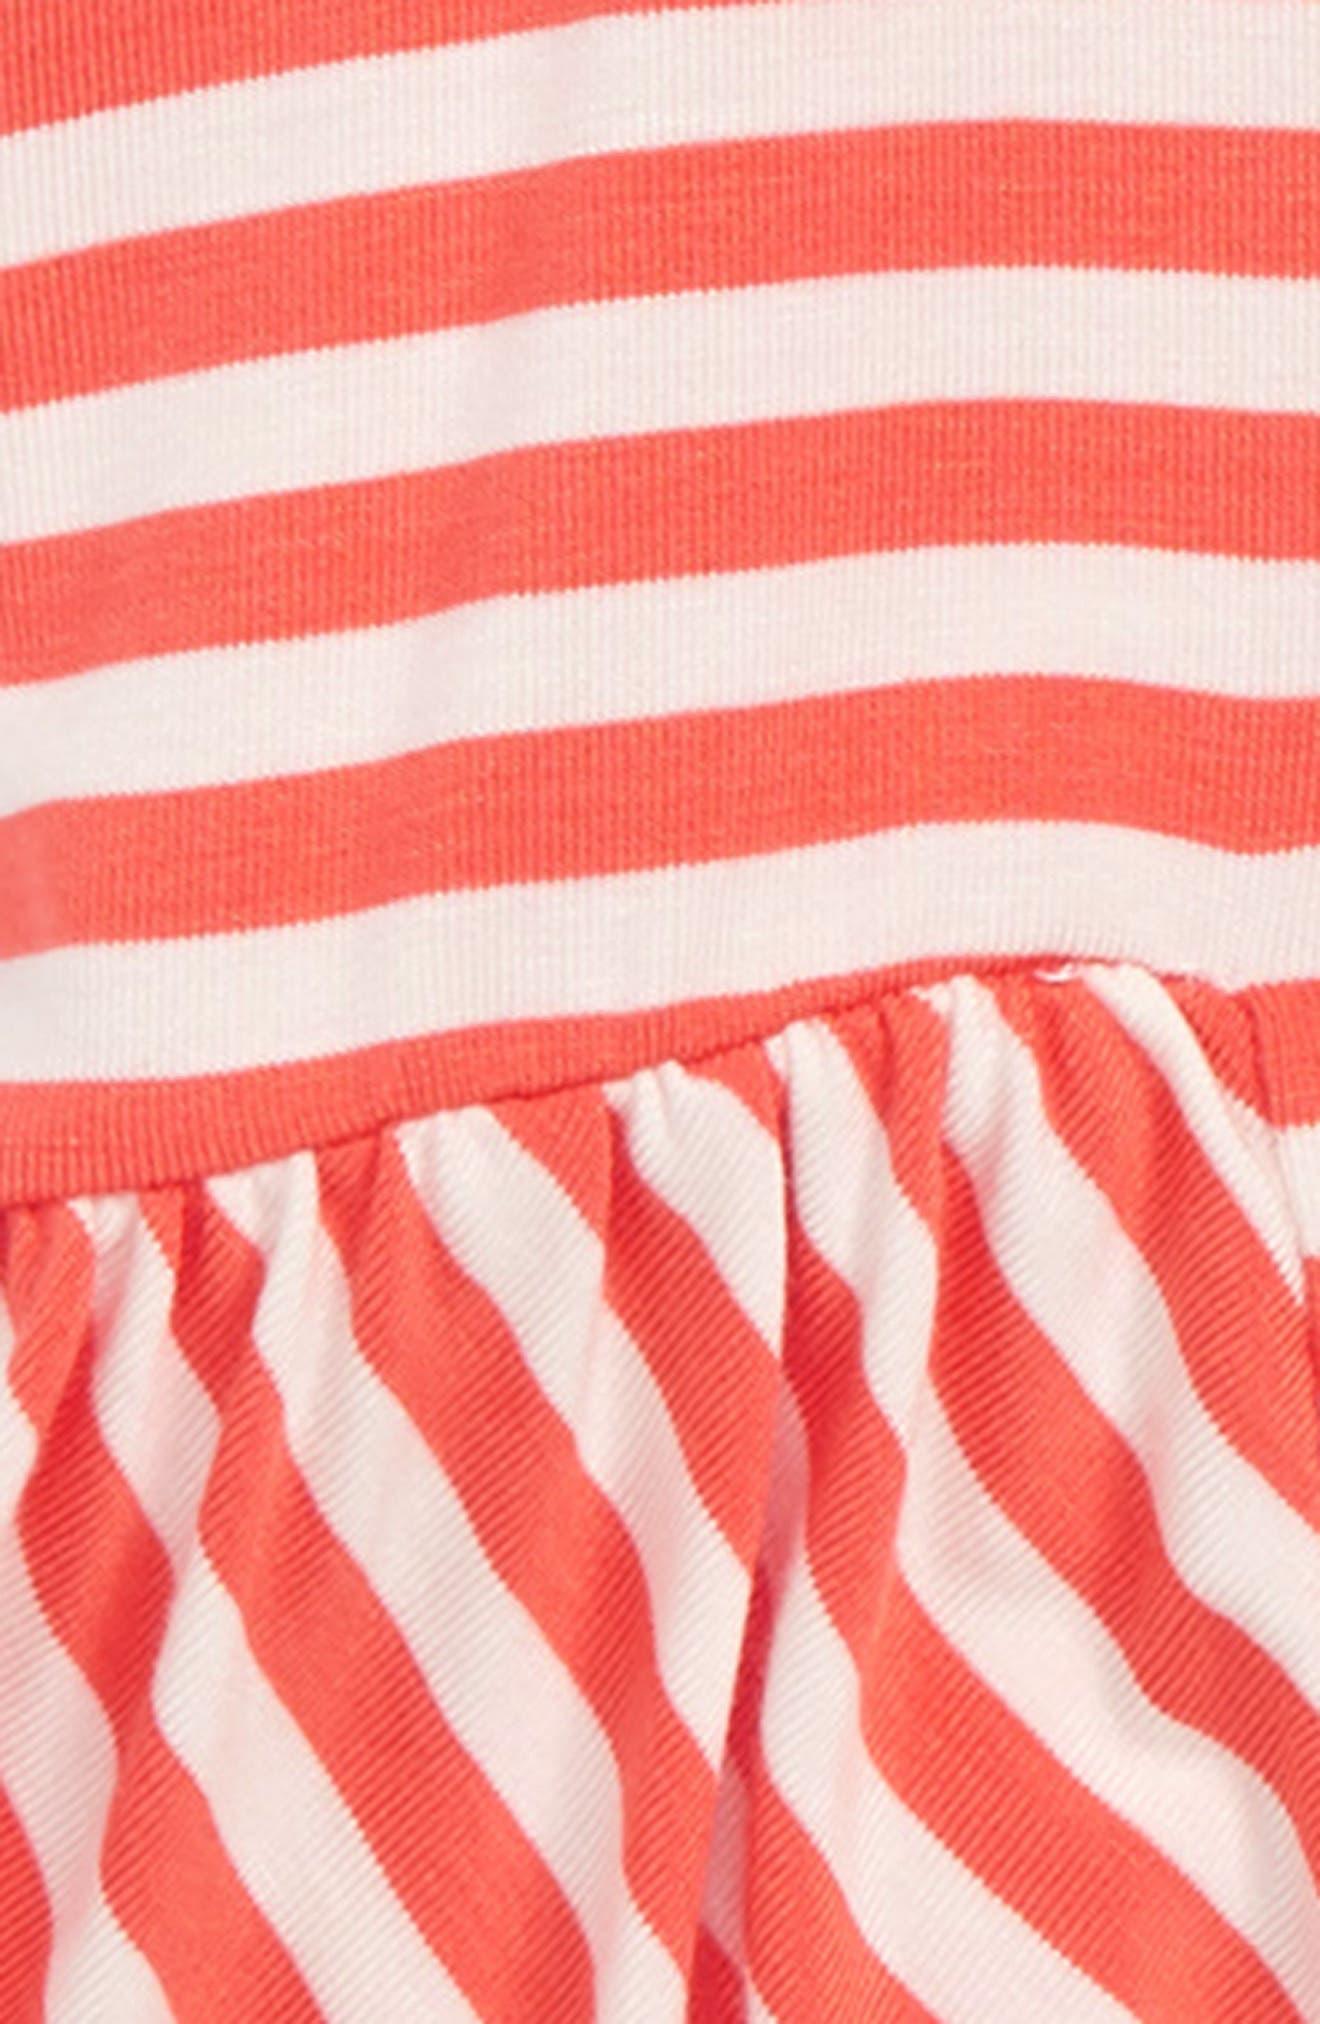 Stripe Peplum Tank,                             Alternate thumbnail 2, color,                             CORAL/ WHITE STRIPE